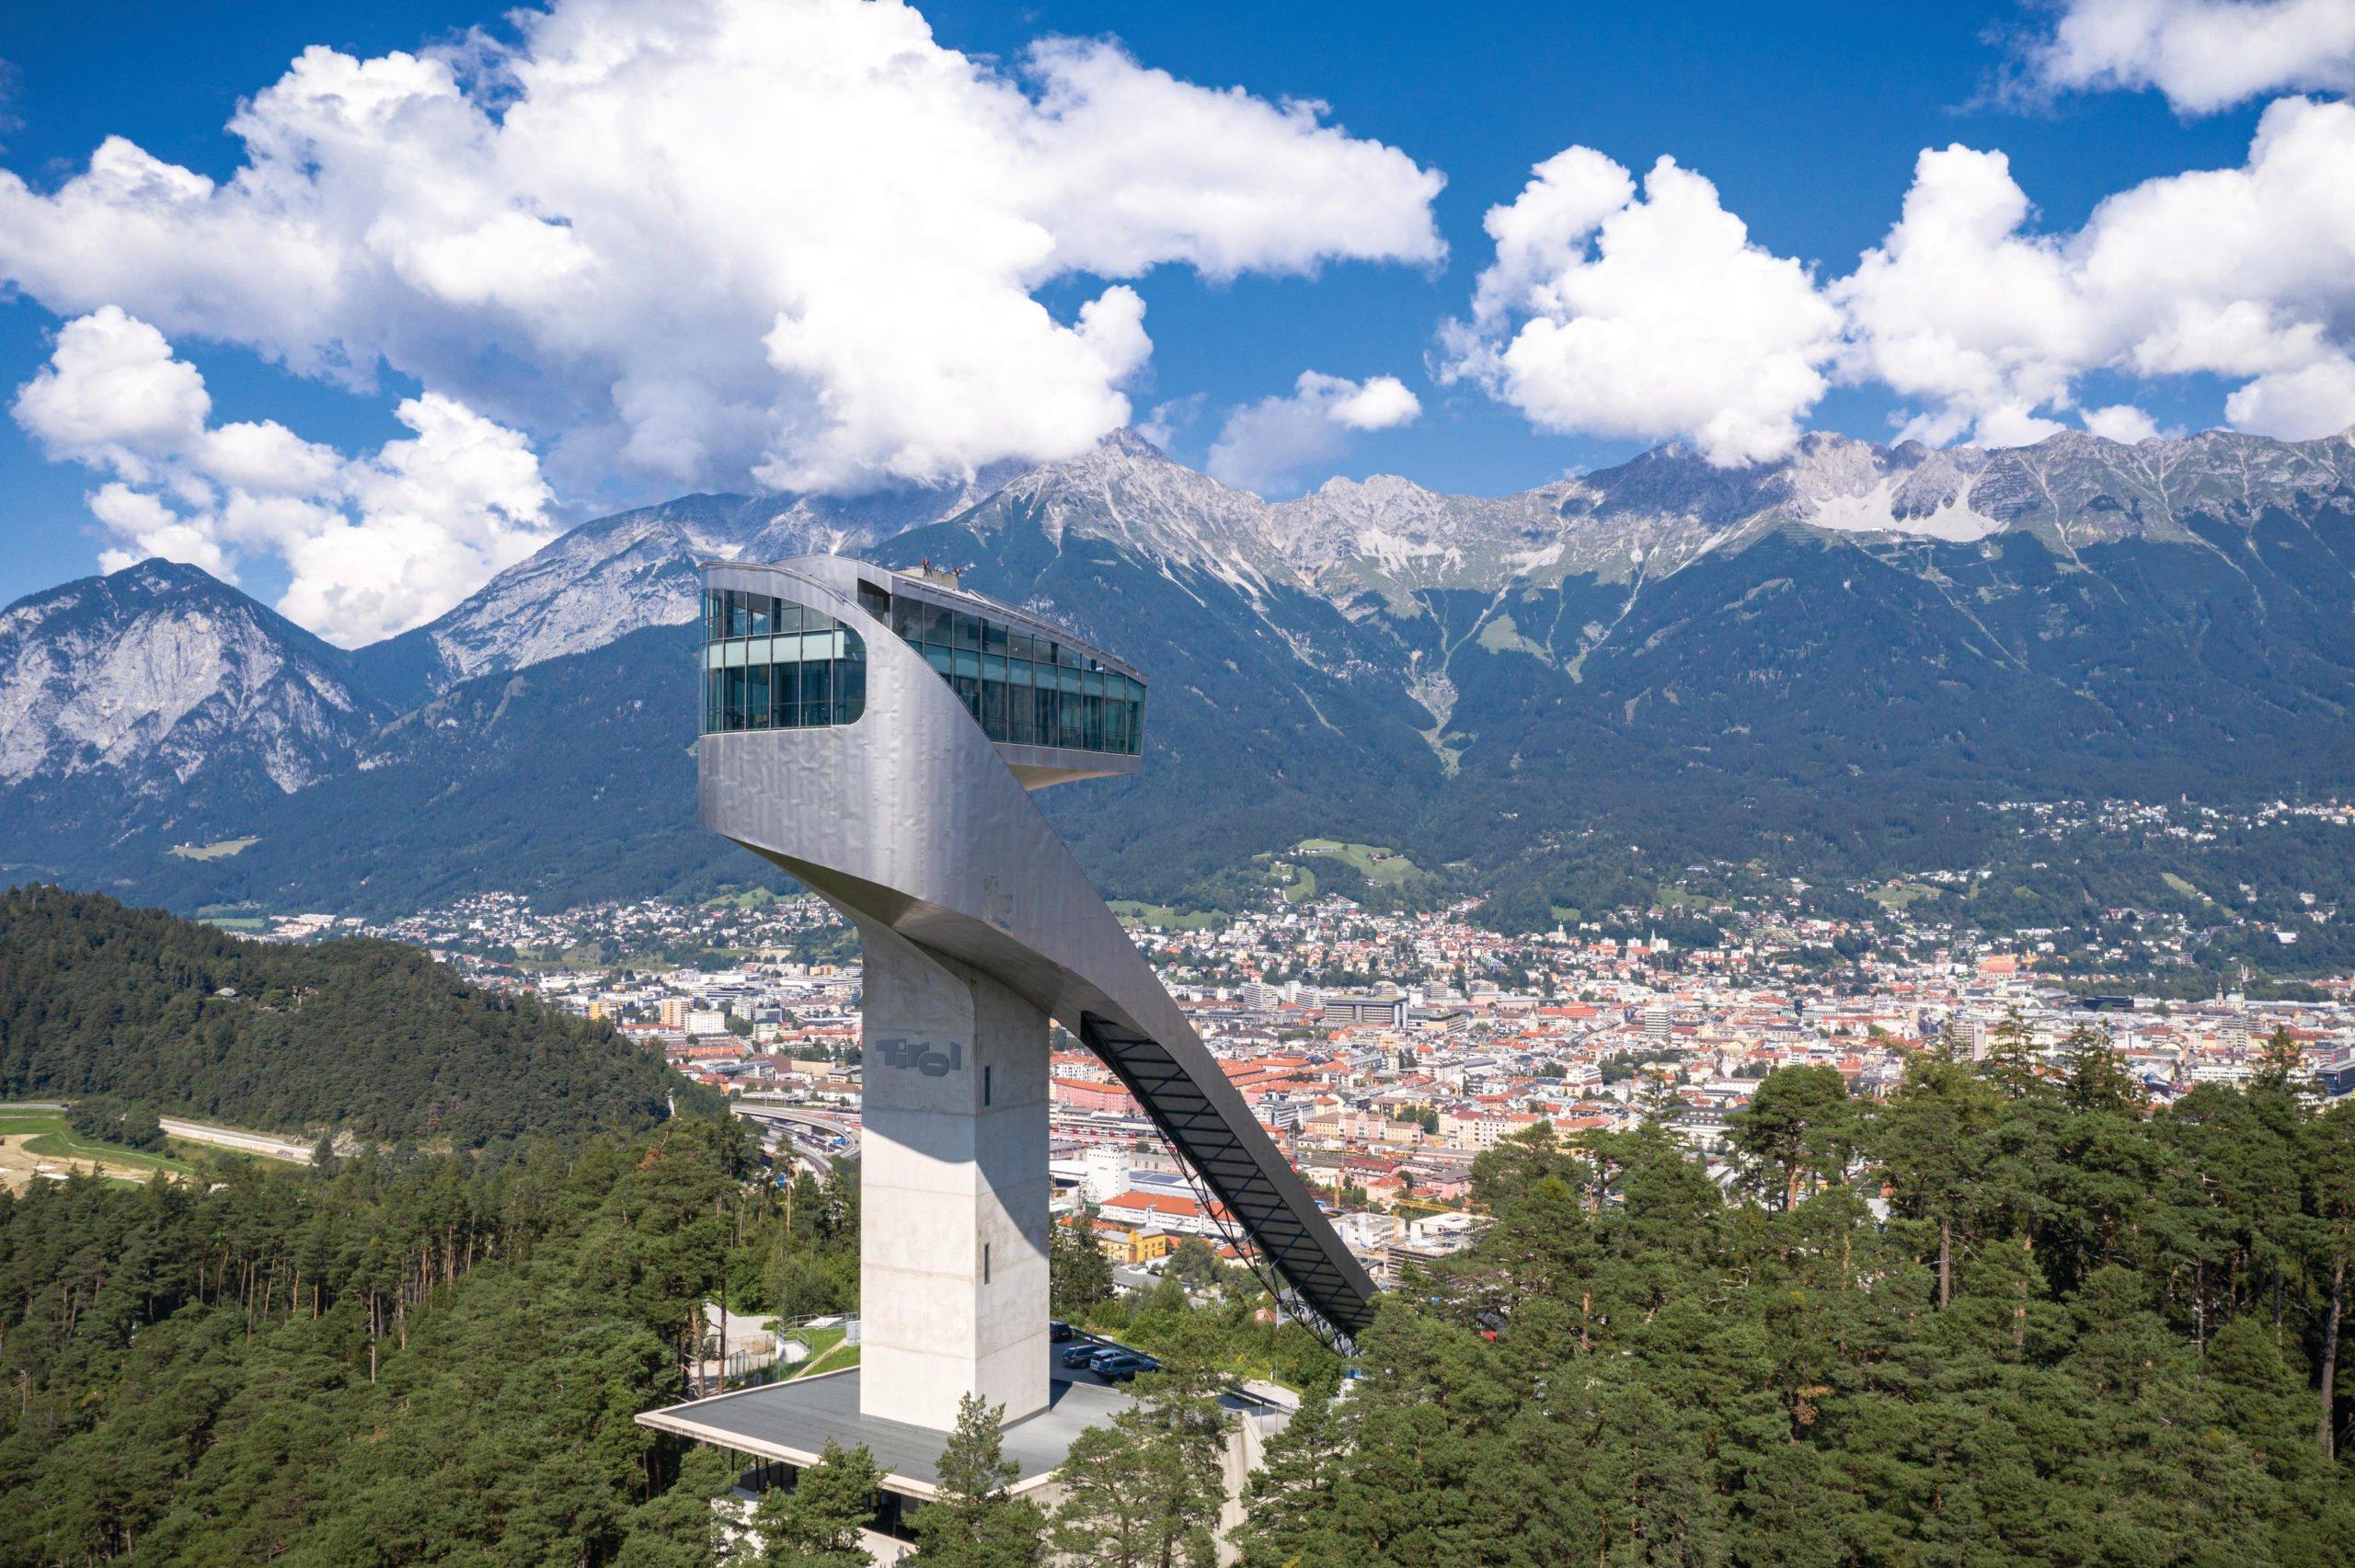 Olympic Ski Jump Things To Do in Innsbruck